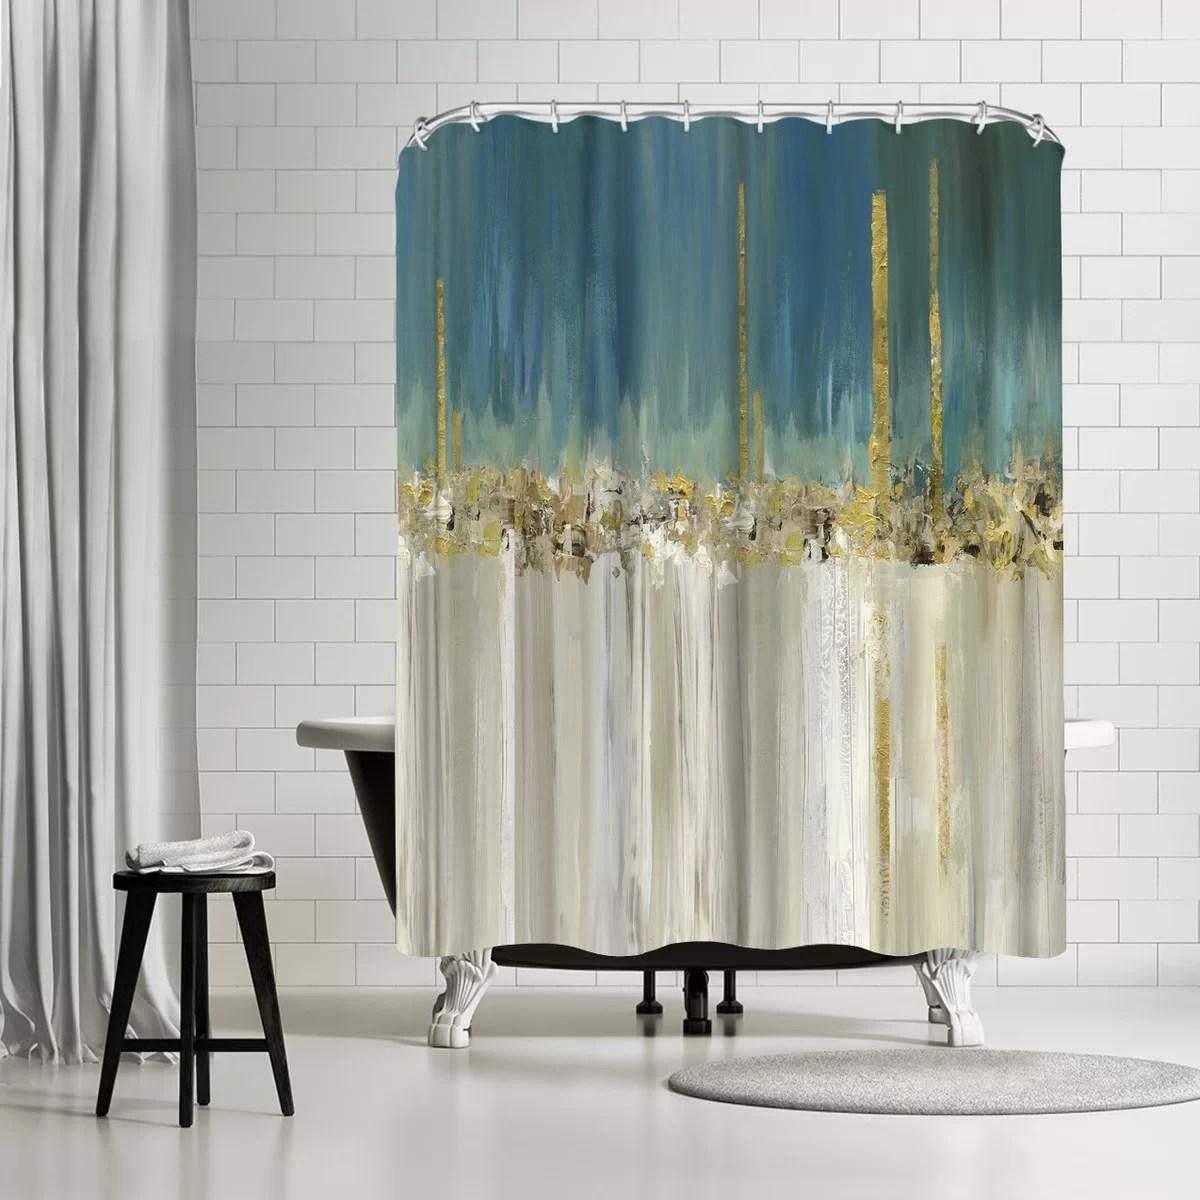 pi creative art shine a light ii single shower curtain